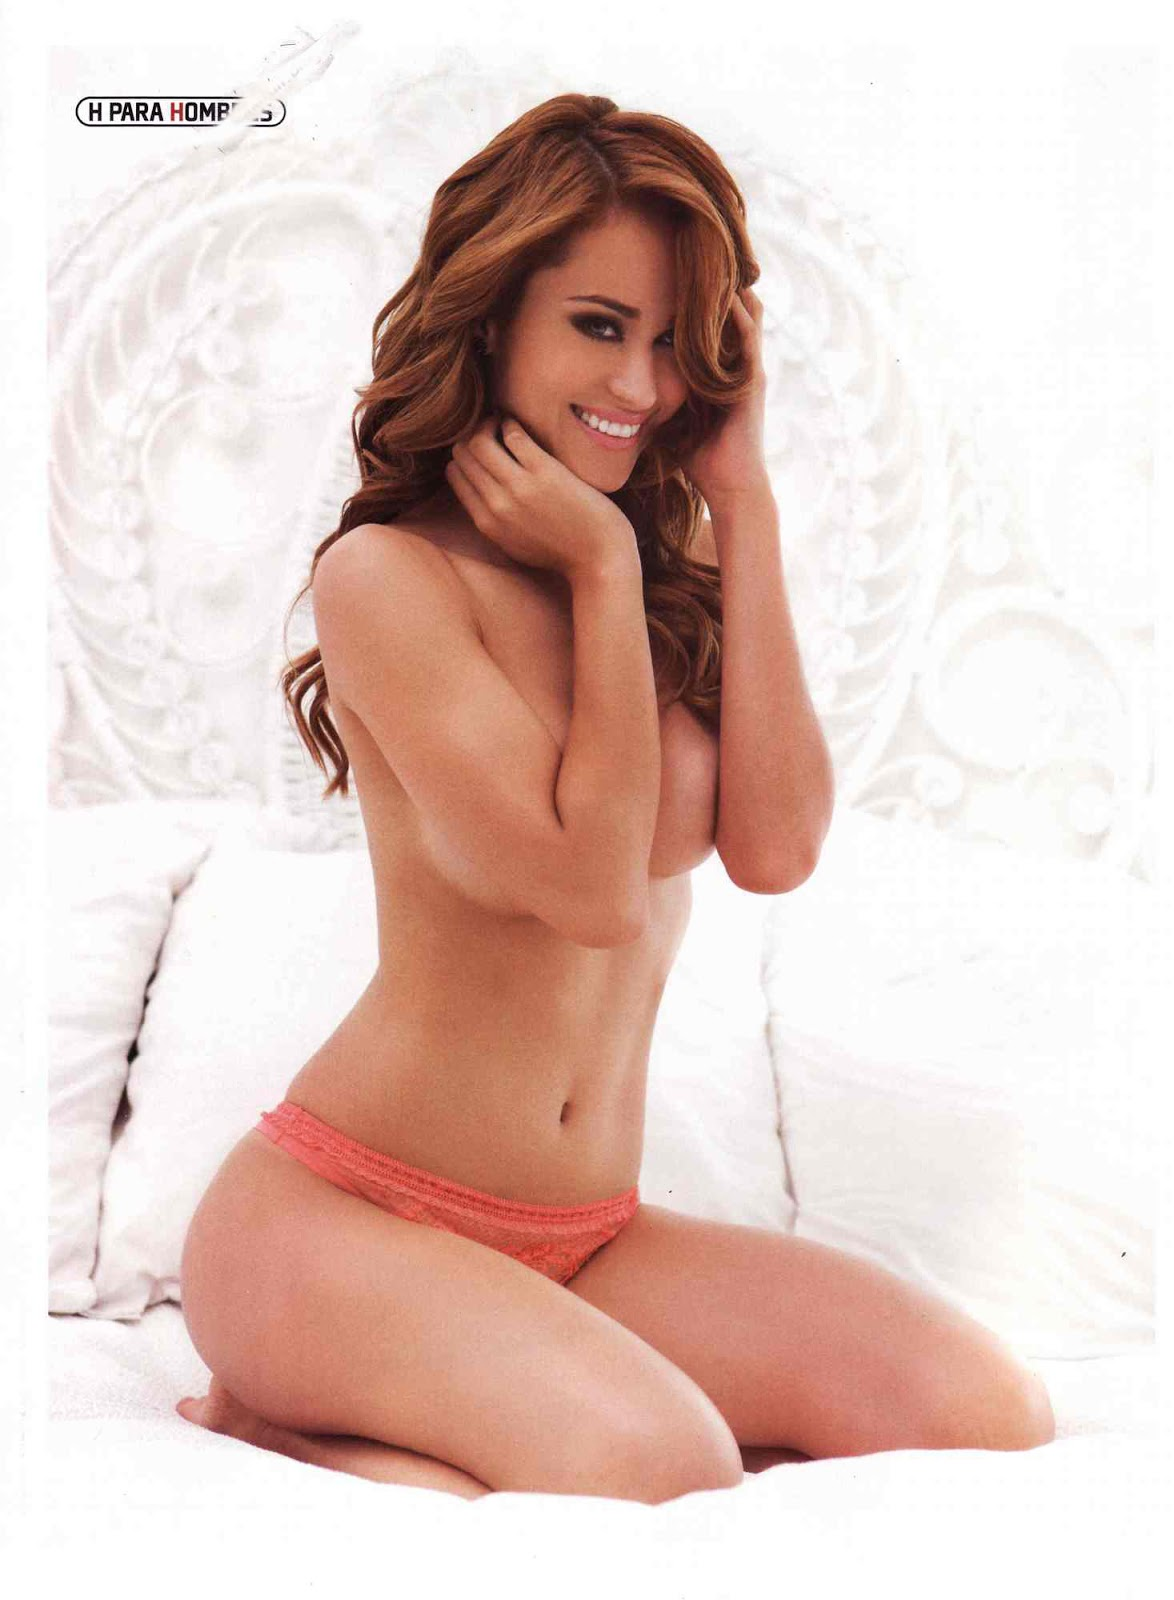 porno videos de Yanet Garcia desnuda panocha